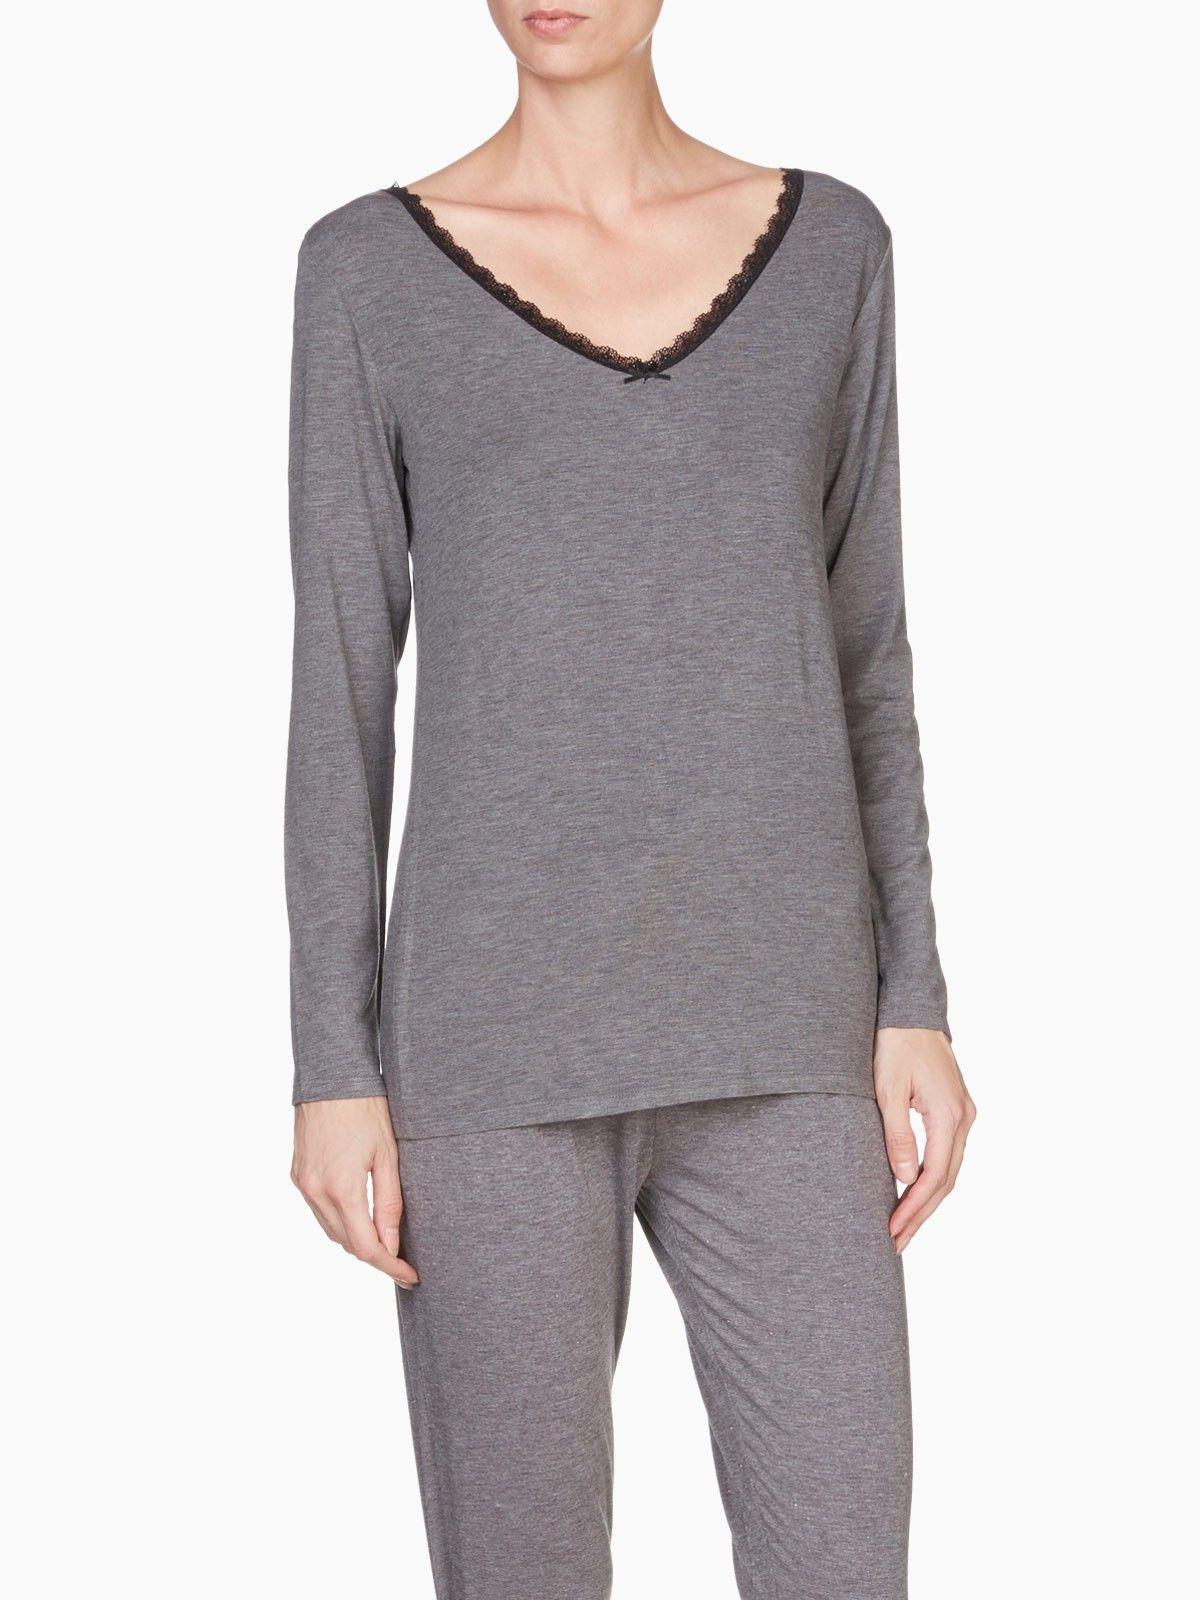 87f120b7d389b T-shirt Coco col en V Gris – T-shirt pour femme – LH by La Halle ...